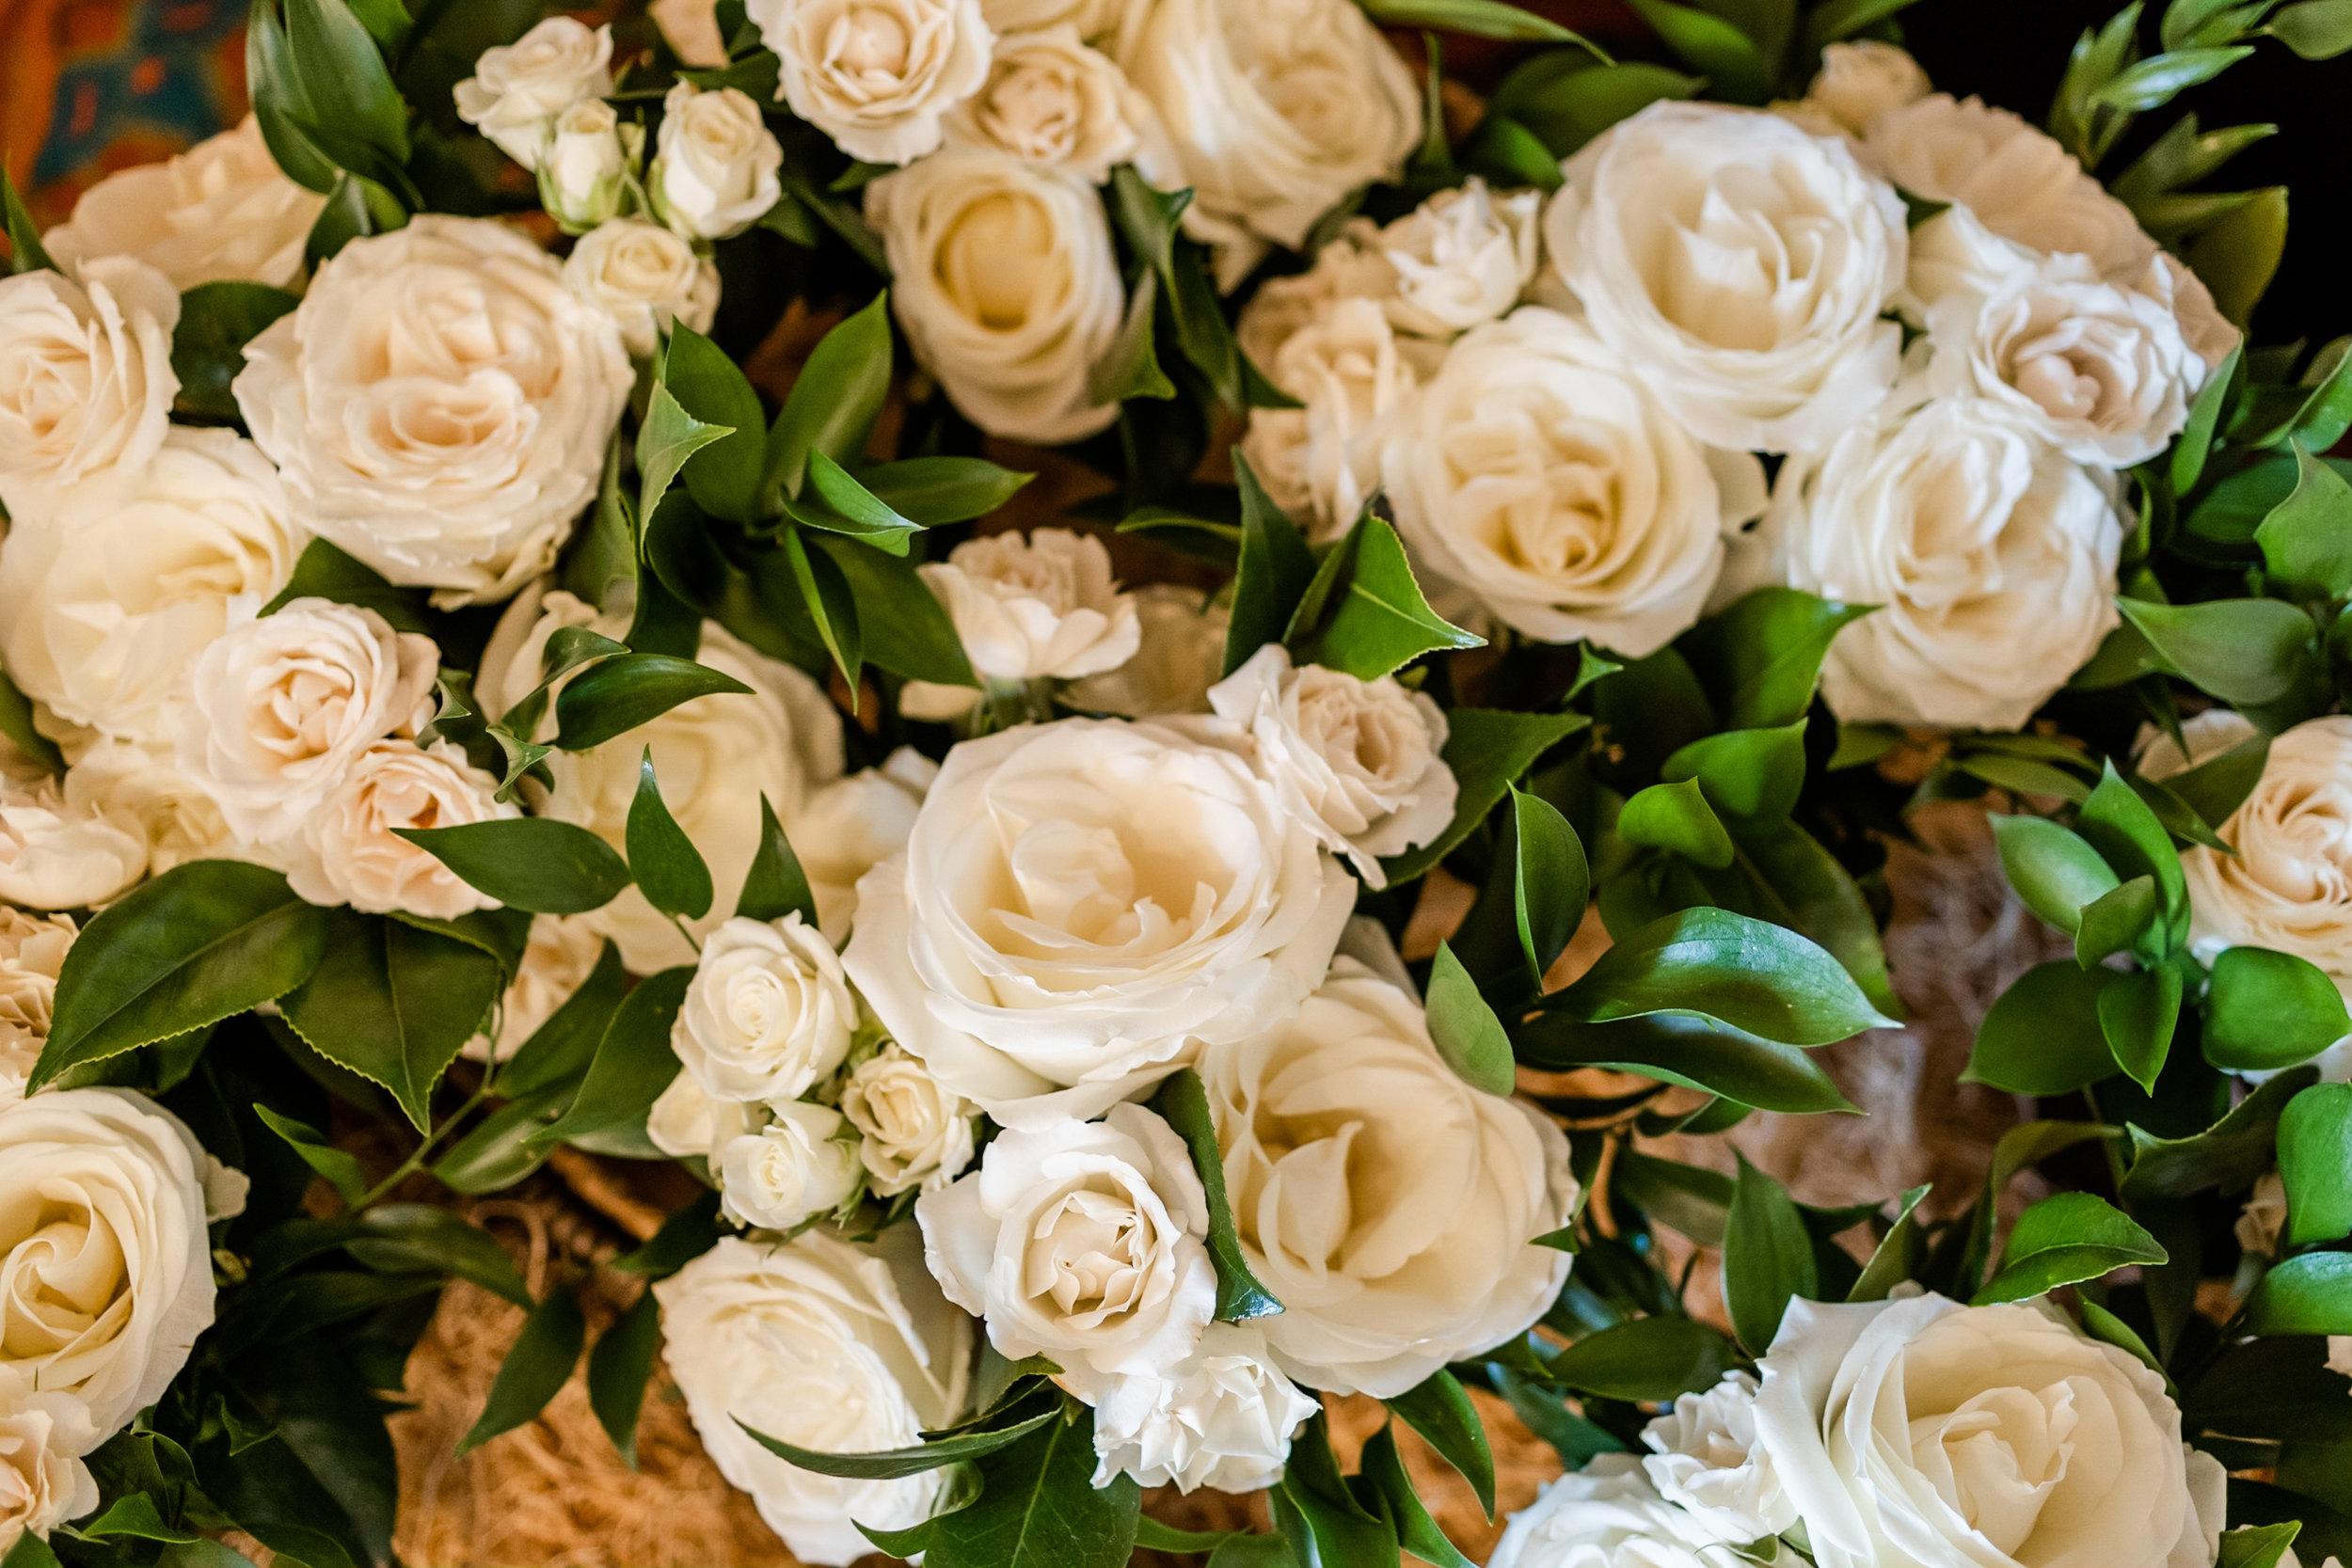 rebeccaylasotras-sandiego-lgbt-wedding-photography-2.jpg